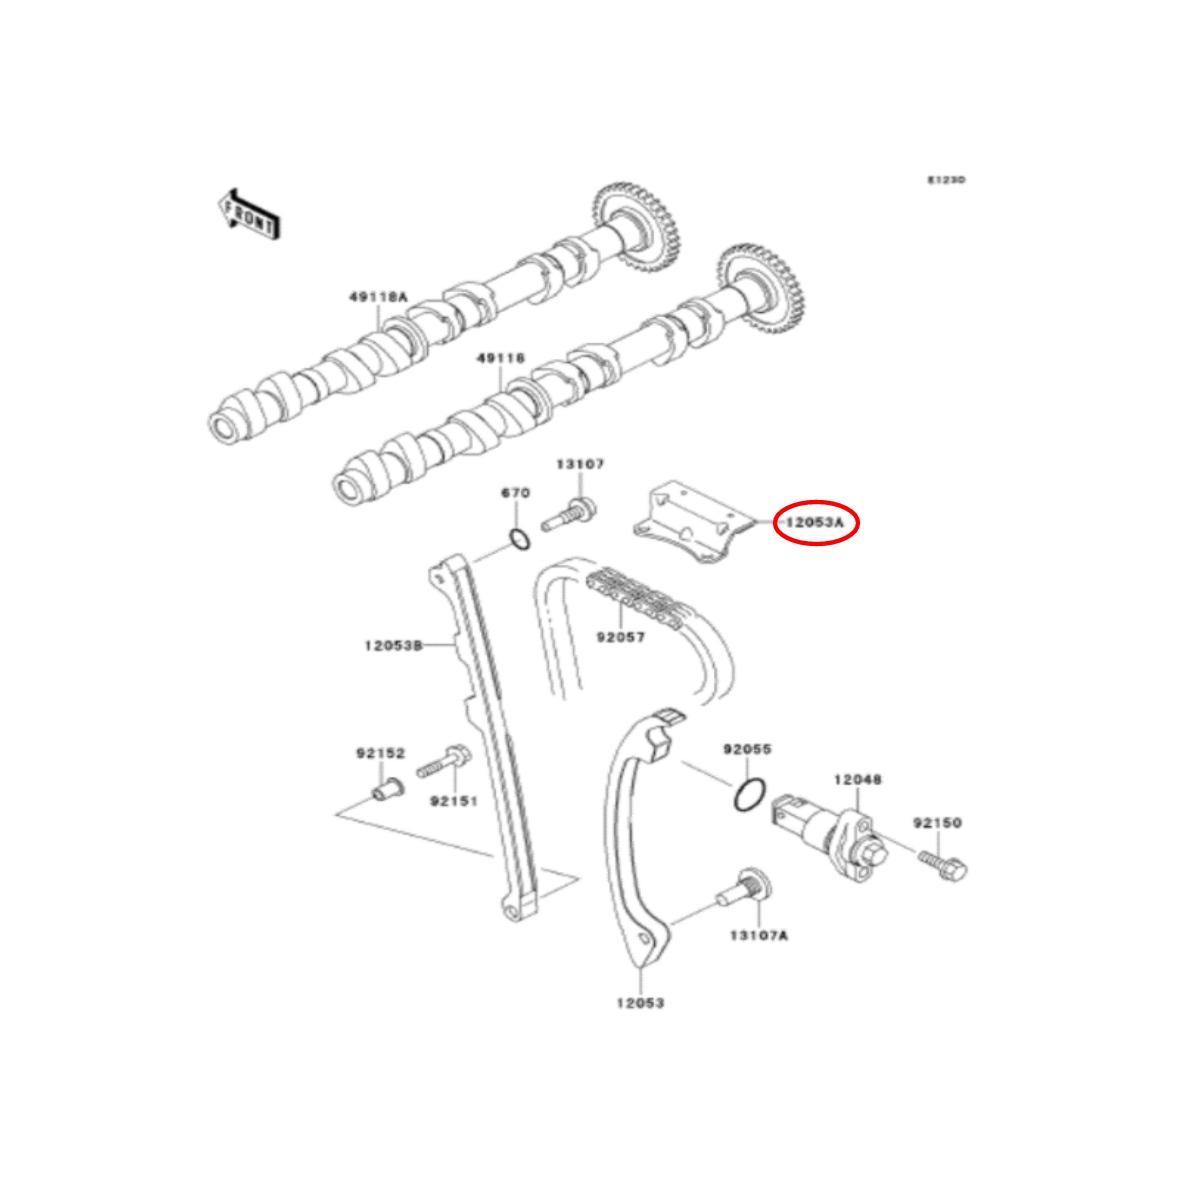 Suporte Tensionador Jet Ski Kawasaki  - Radical Peças - Peças para Jet Ski